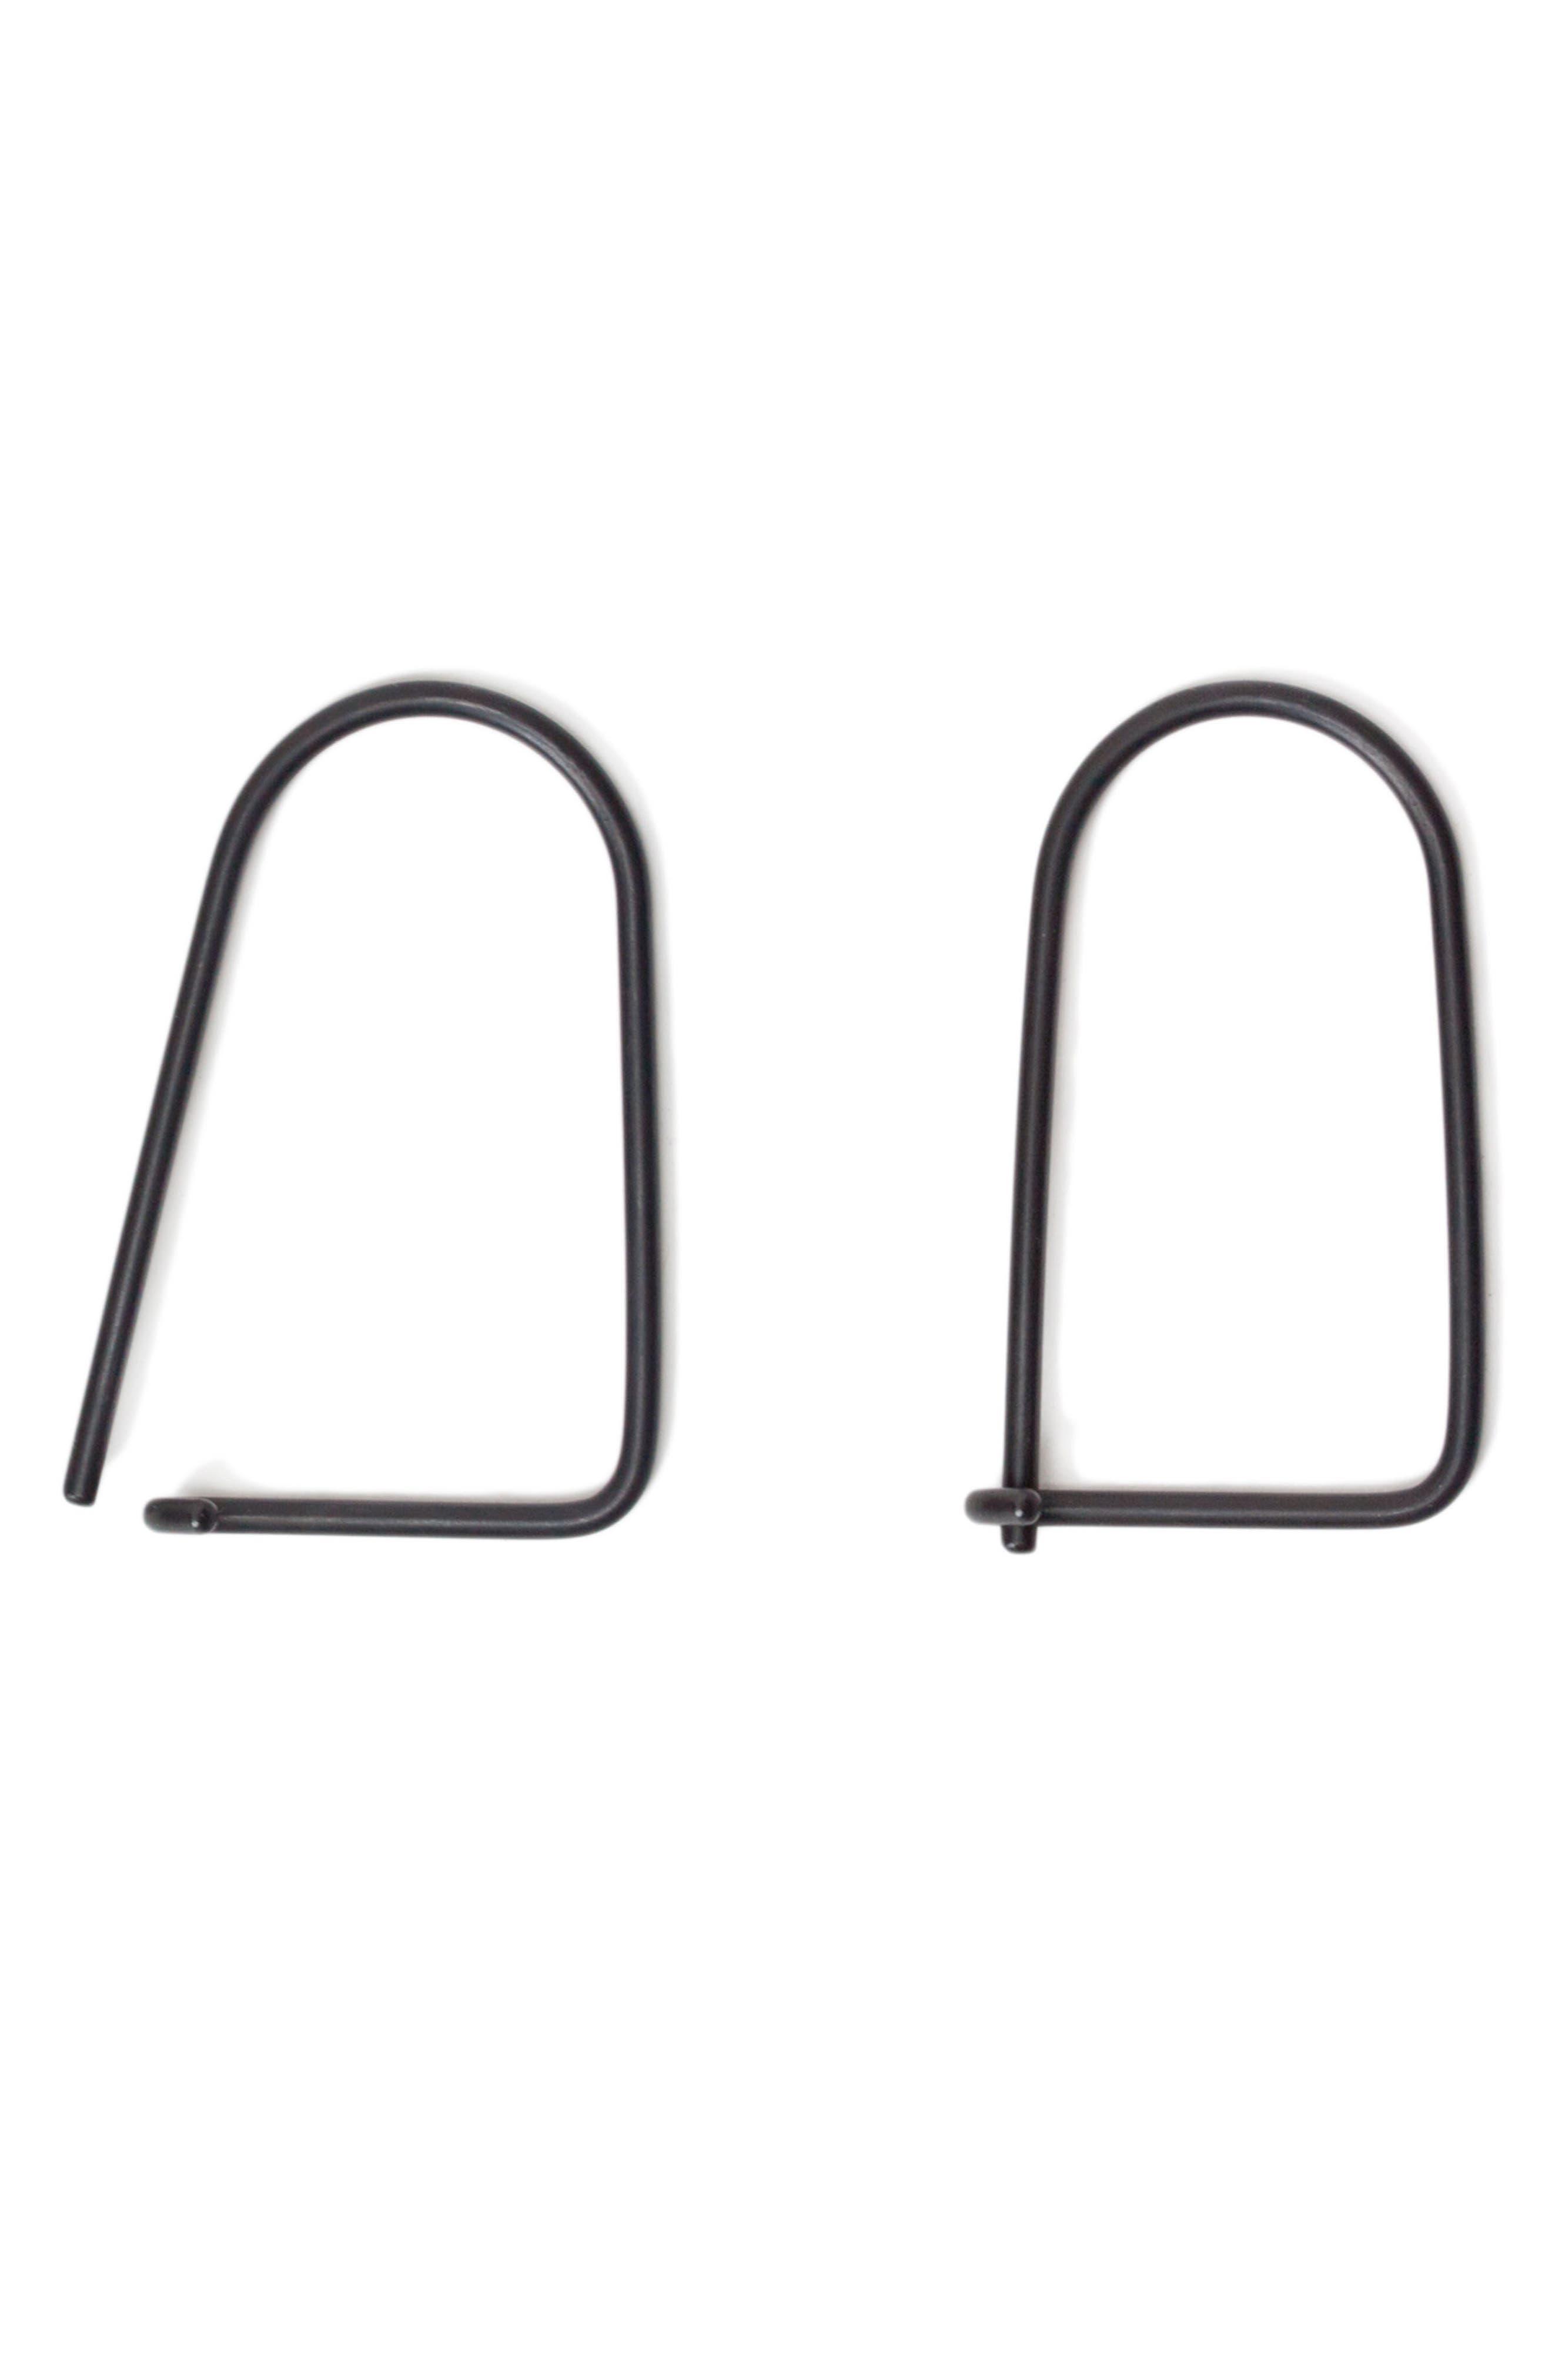 Wilson Carbon Black Steel Key Ring,                             Alternate thumbnail 3, color,                             040